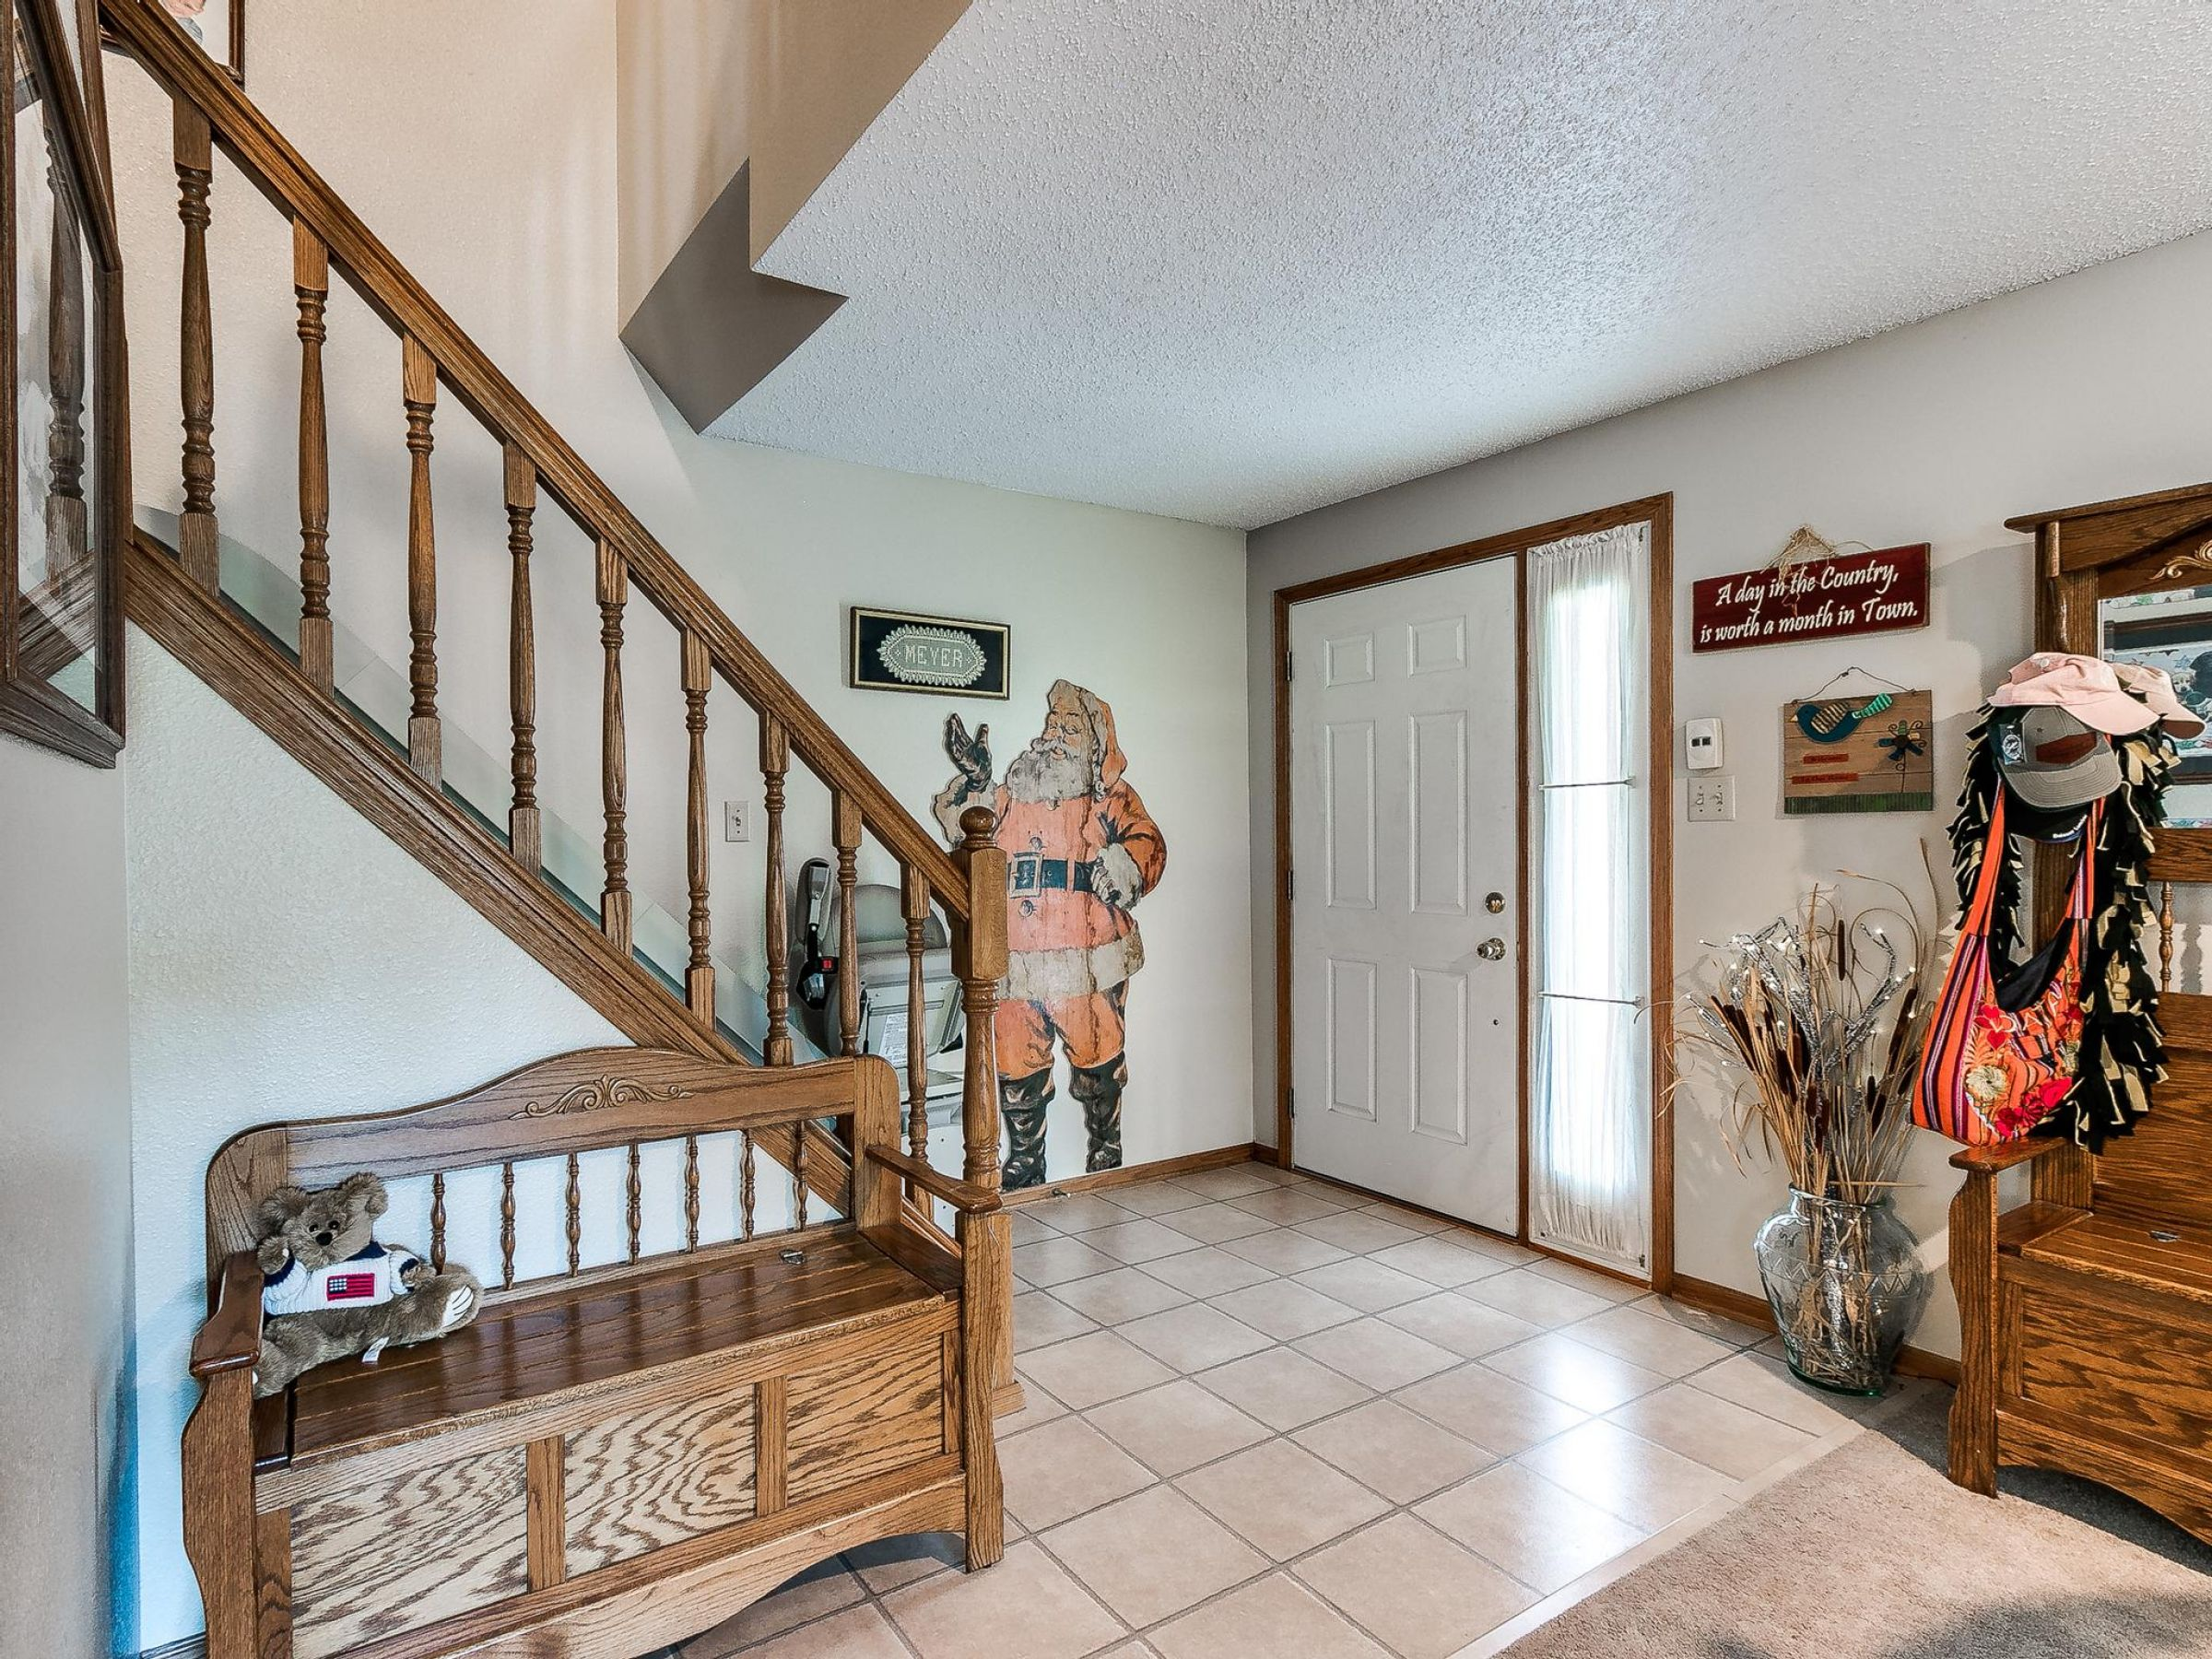 residential-warren-county-iowa-3-acres-listing-number-15593-3-2021-06-18-155612.jpg